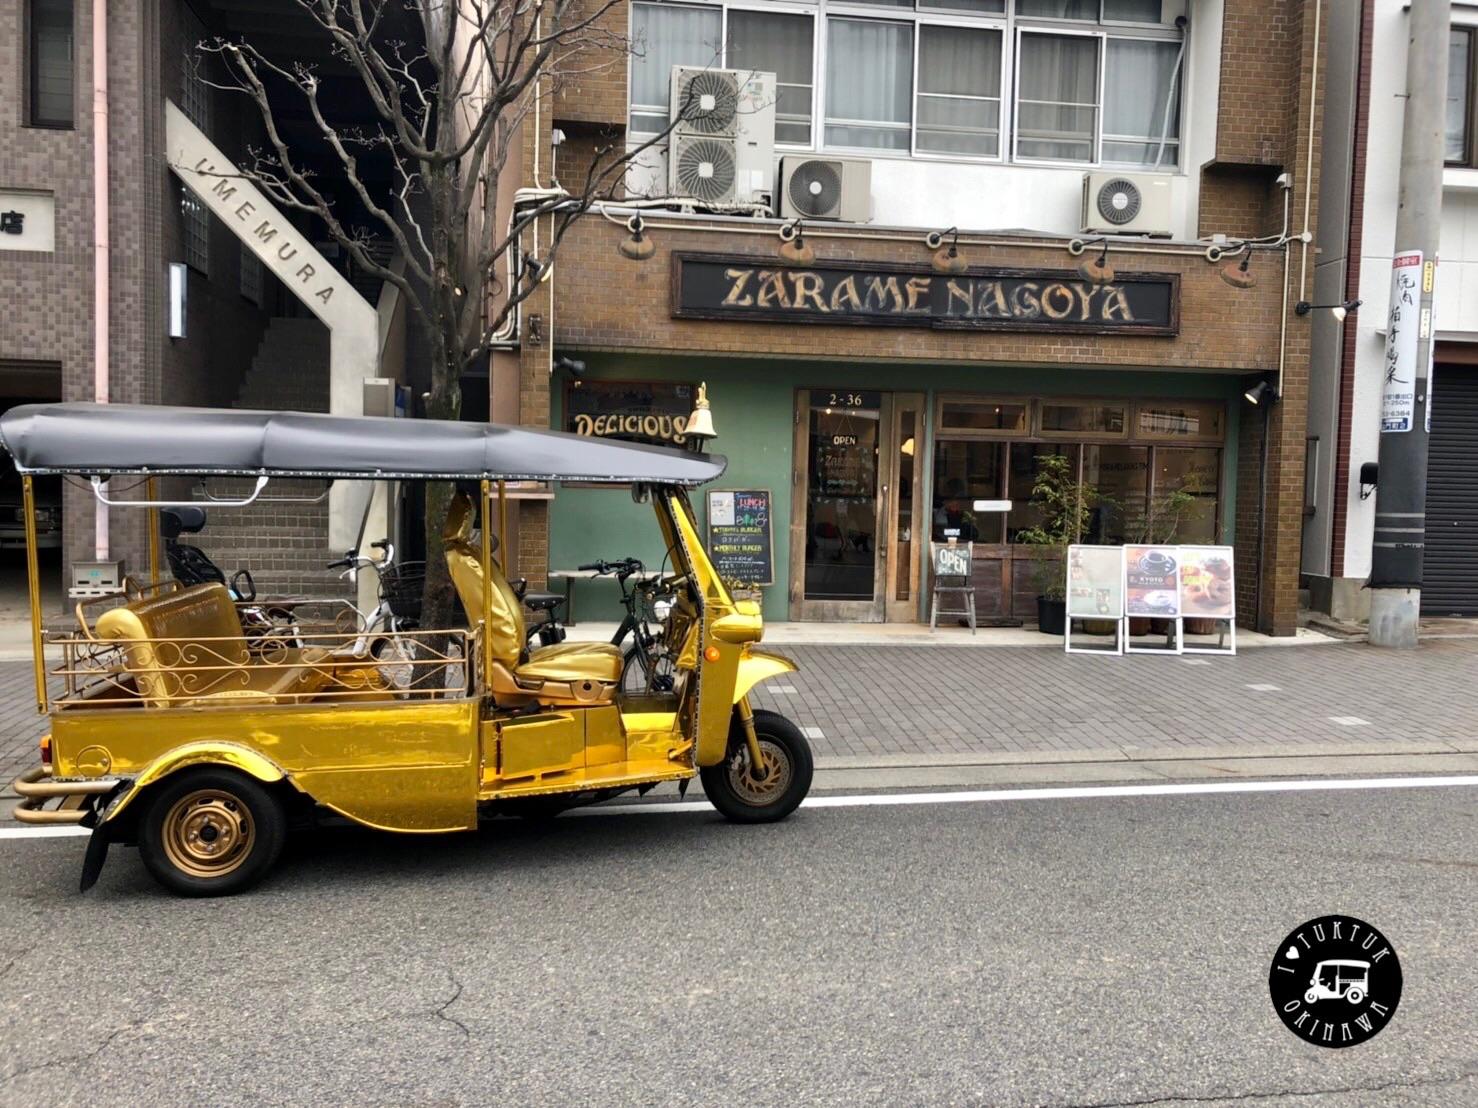 「ZARAME NAGOYA」ドーナツ屋さん。ボリュームもあって美味しいです!